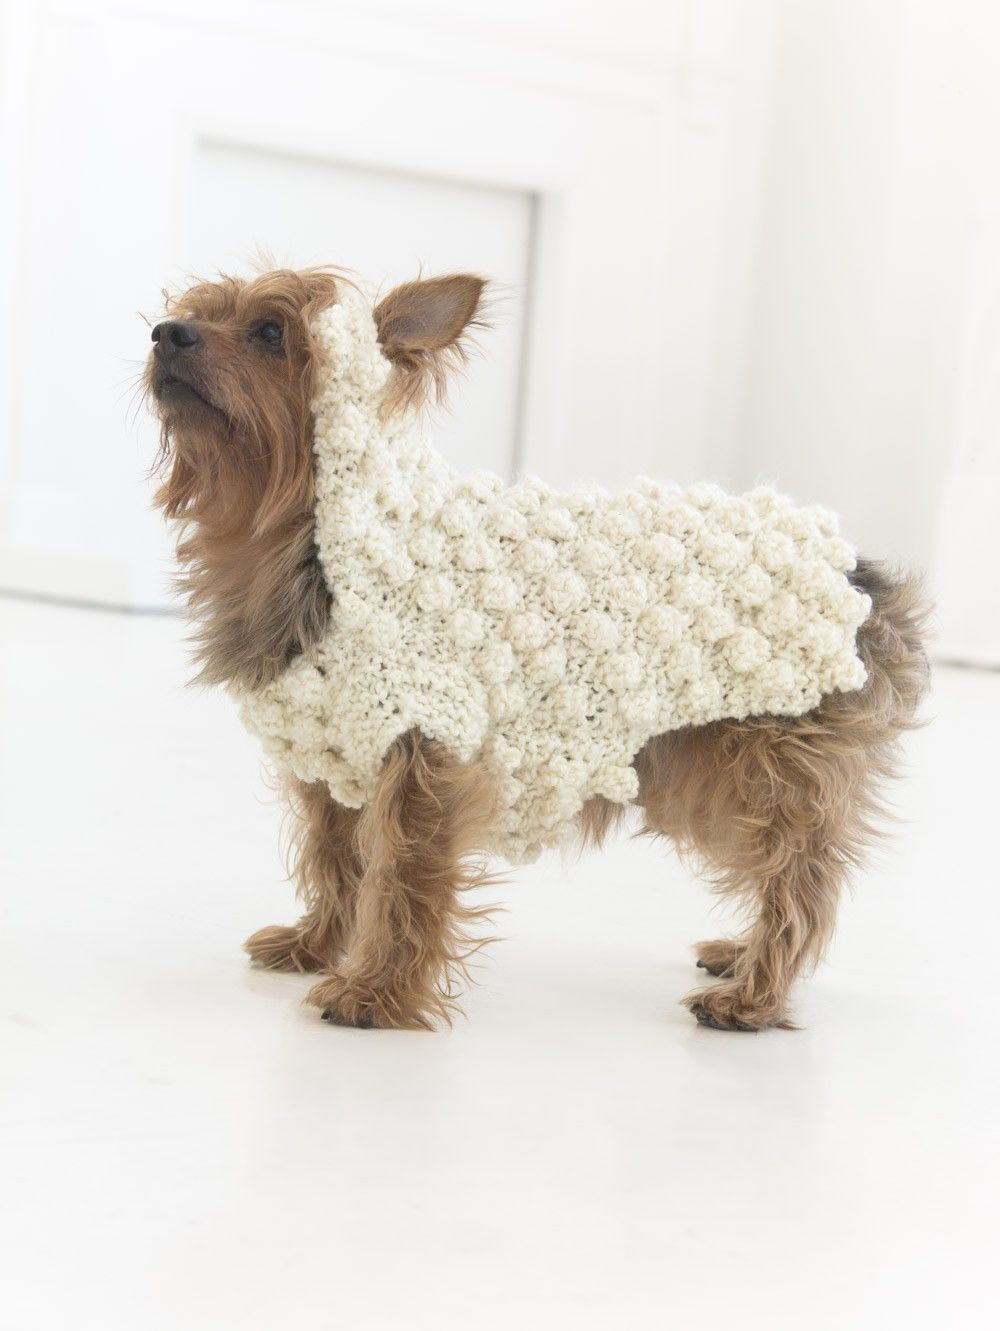 Year Of The Sheep Sweater (Knit) | Dog sweaters | Pinterest | Gato